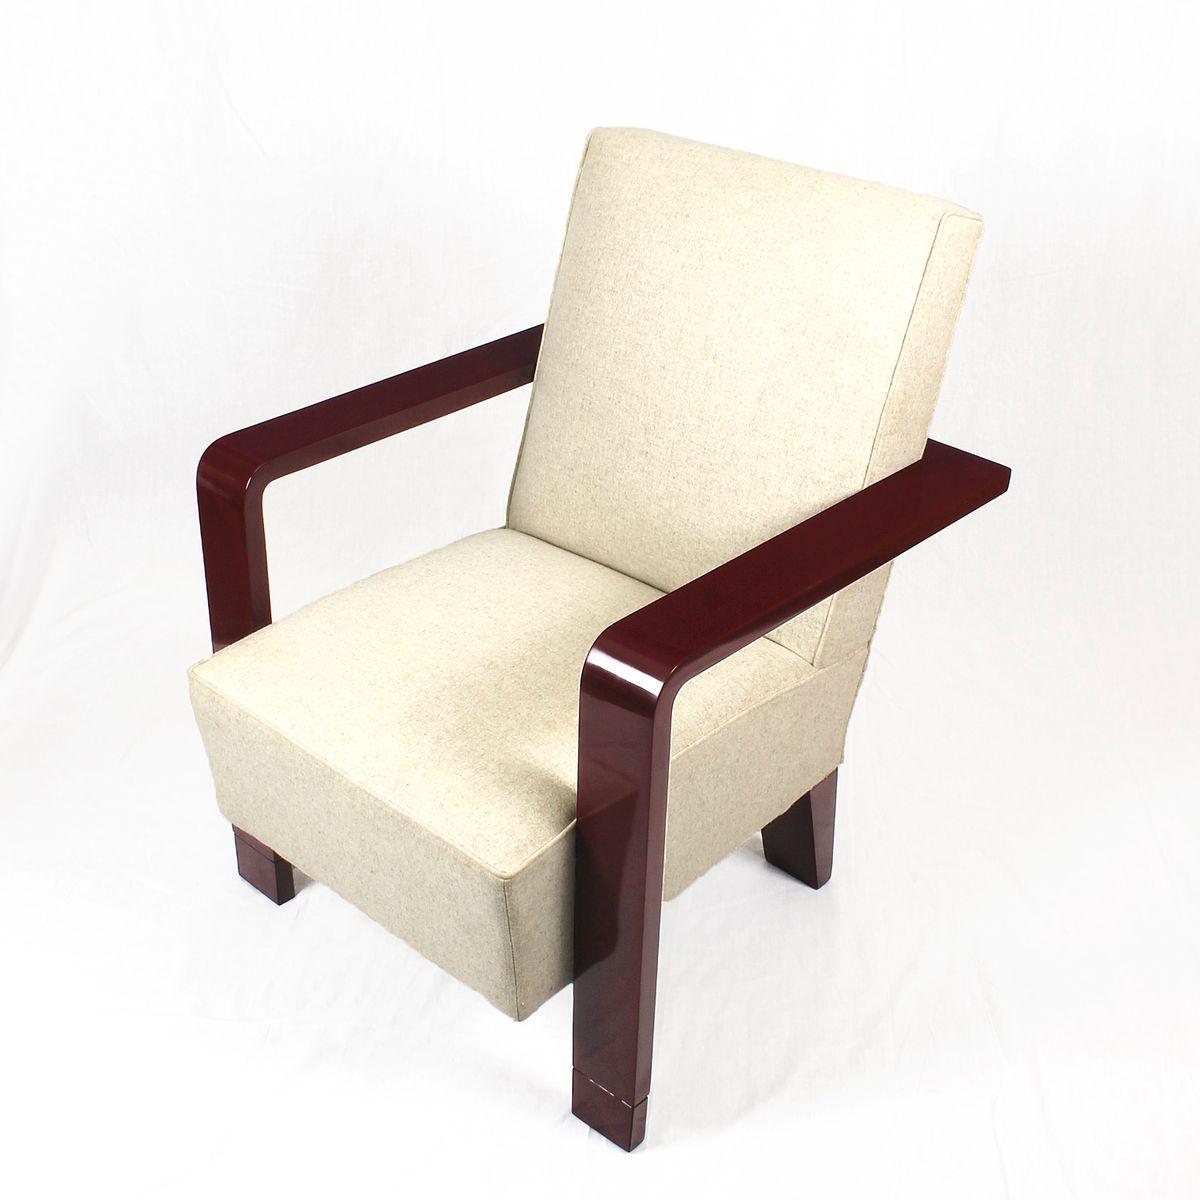 kubistische art deco sessel 1930er 2er set bei pamono kaufen. Black Bedroom Furniture Sets. Home Design Ideas